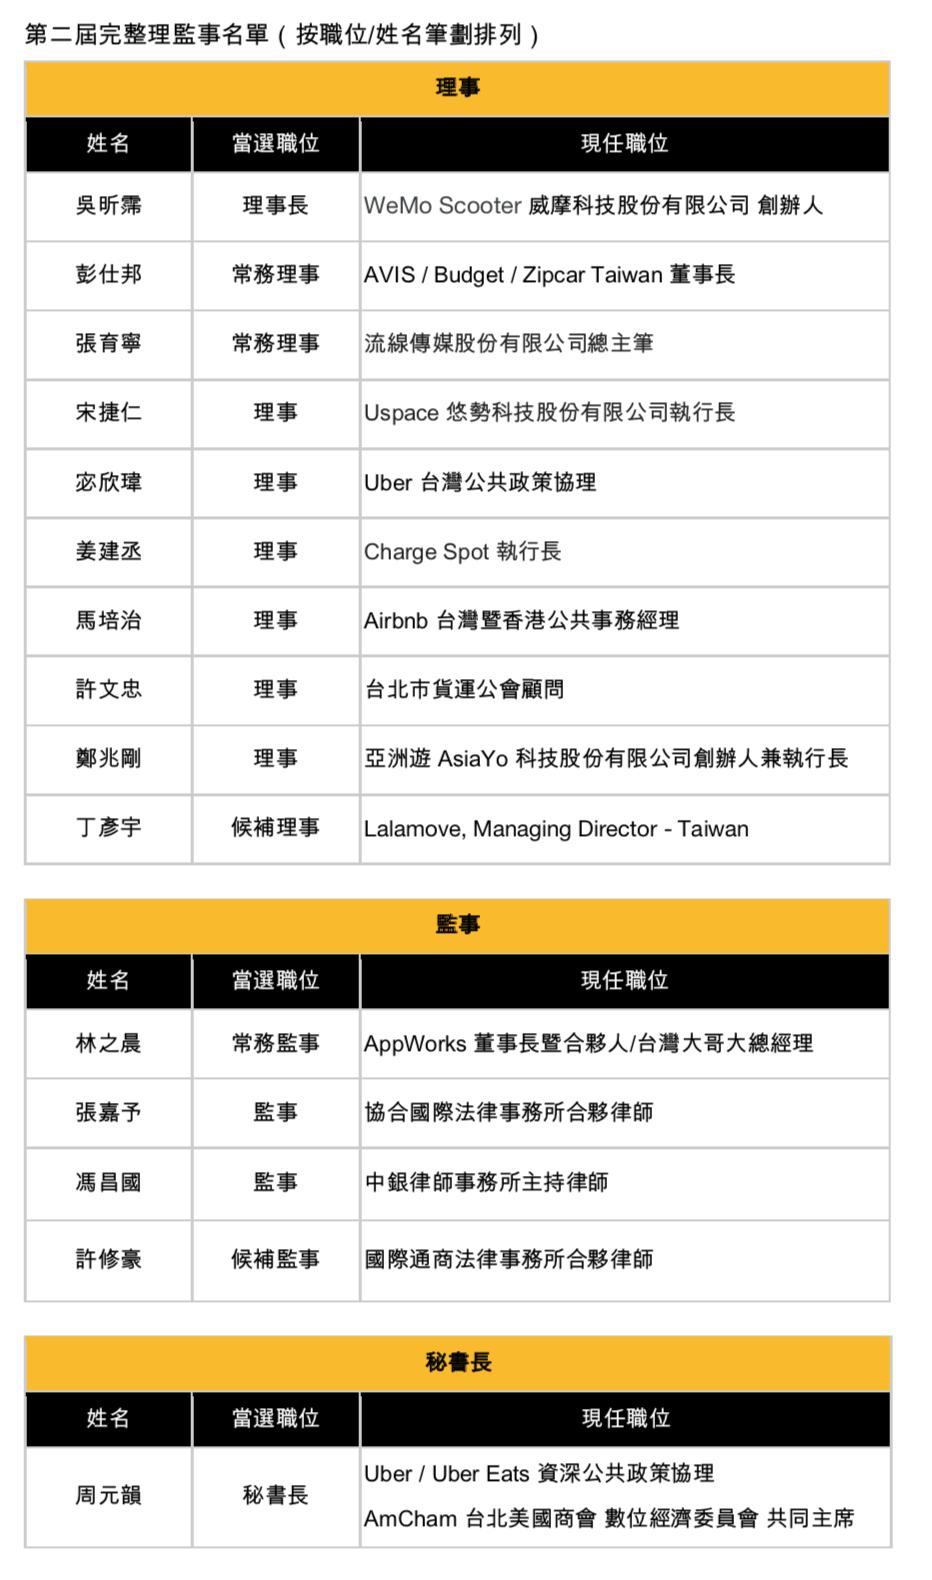 SEAT第二屆完整理監事名單。 社團法人台灣協作暨共享經濟協會/提供